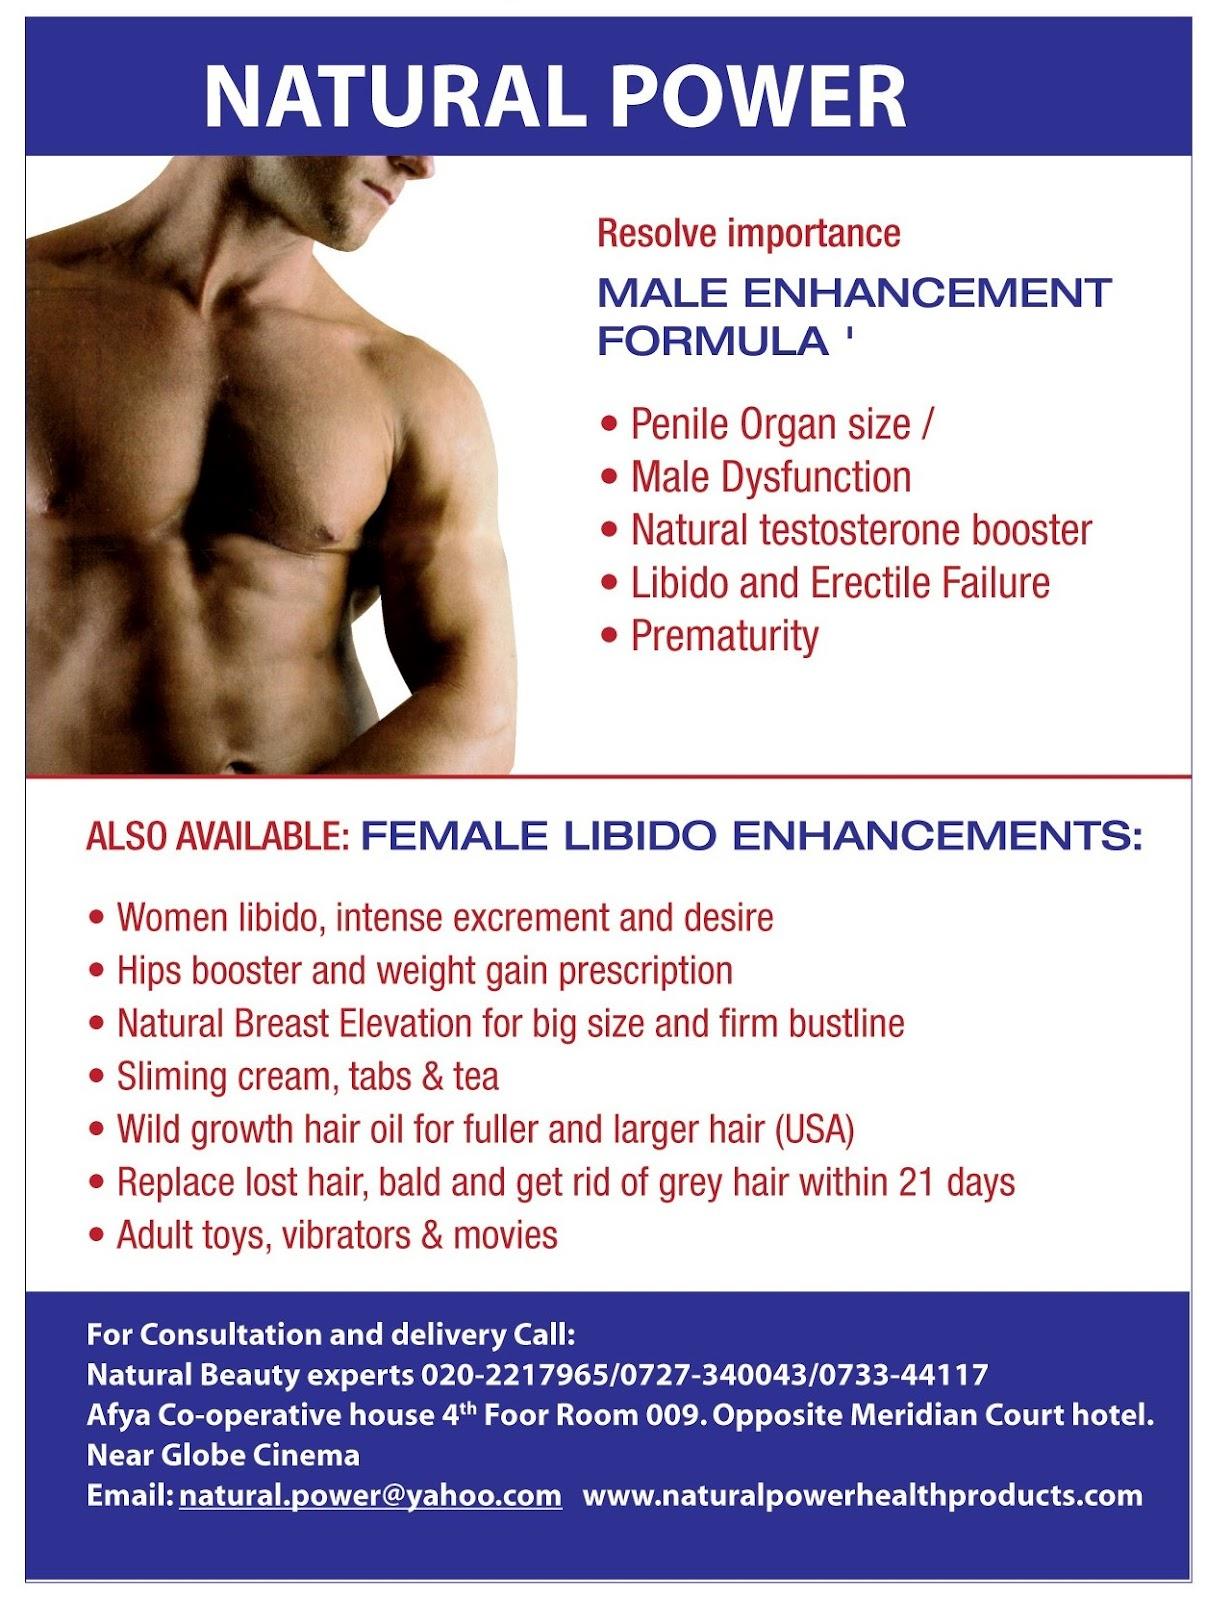 Permanent natural male enhancement exercises yoga